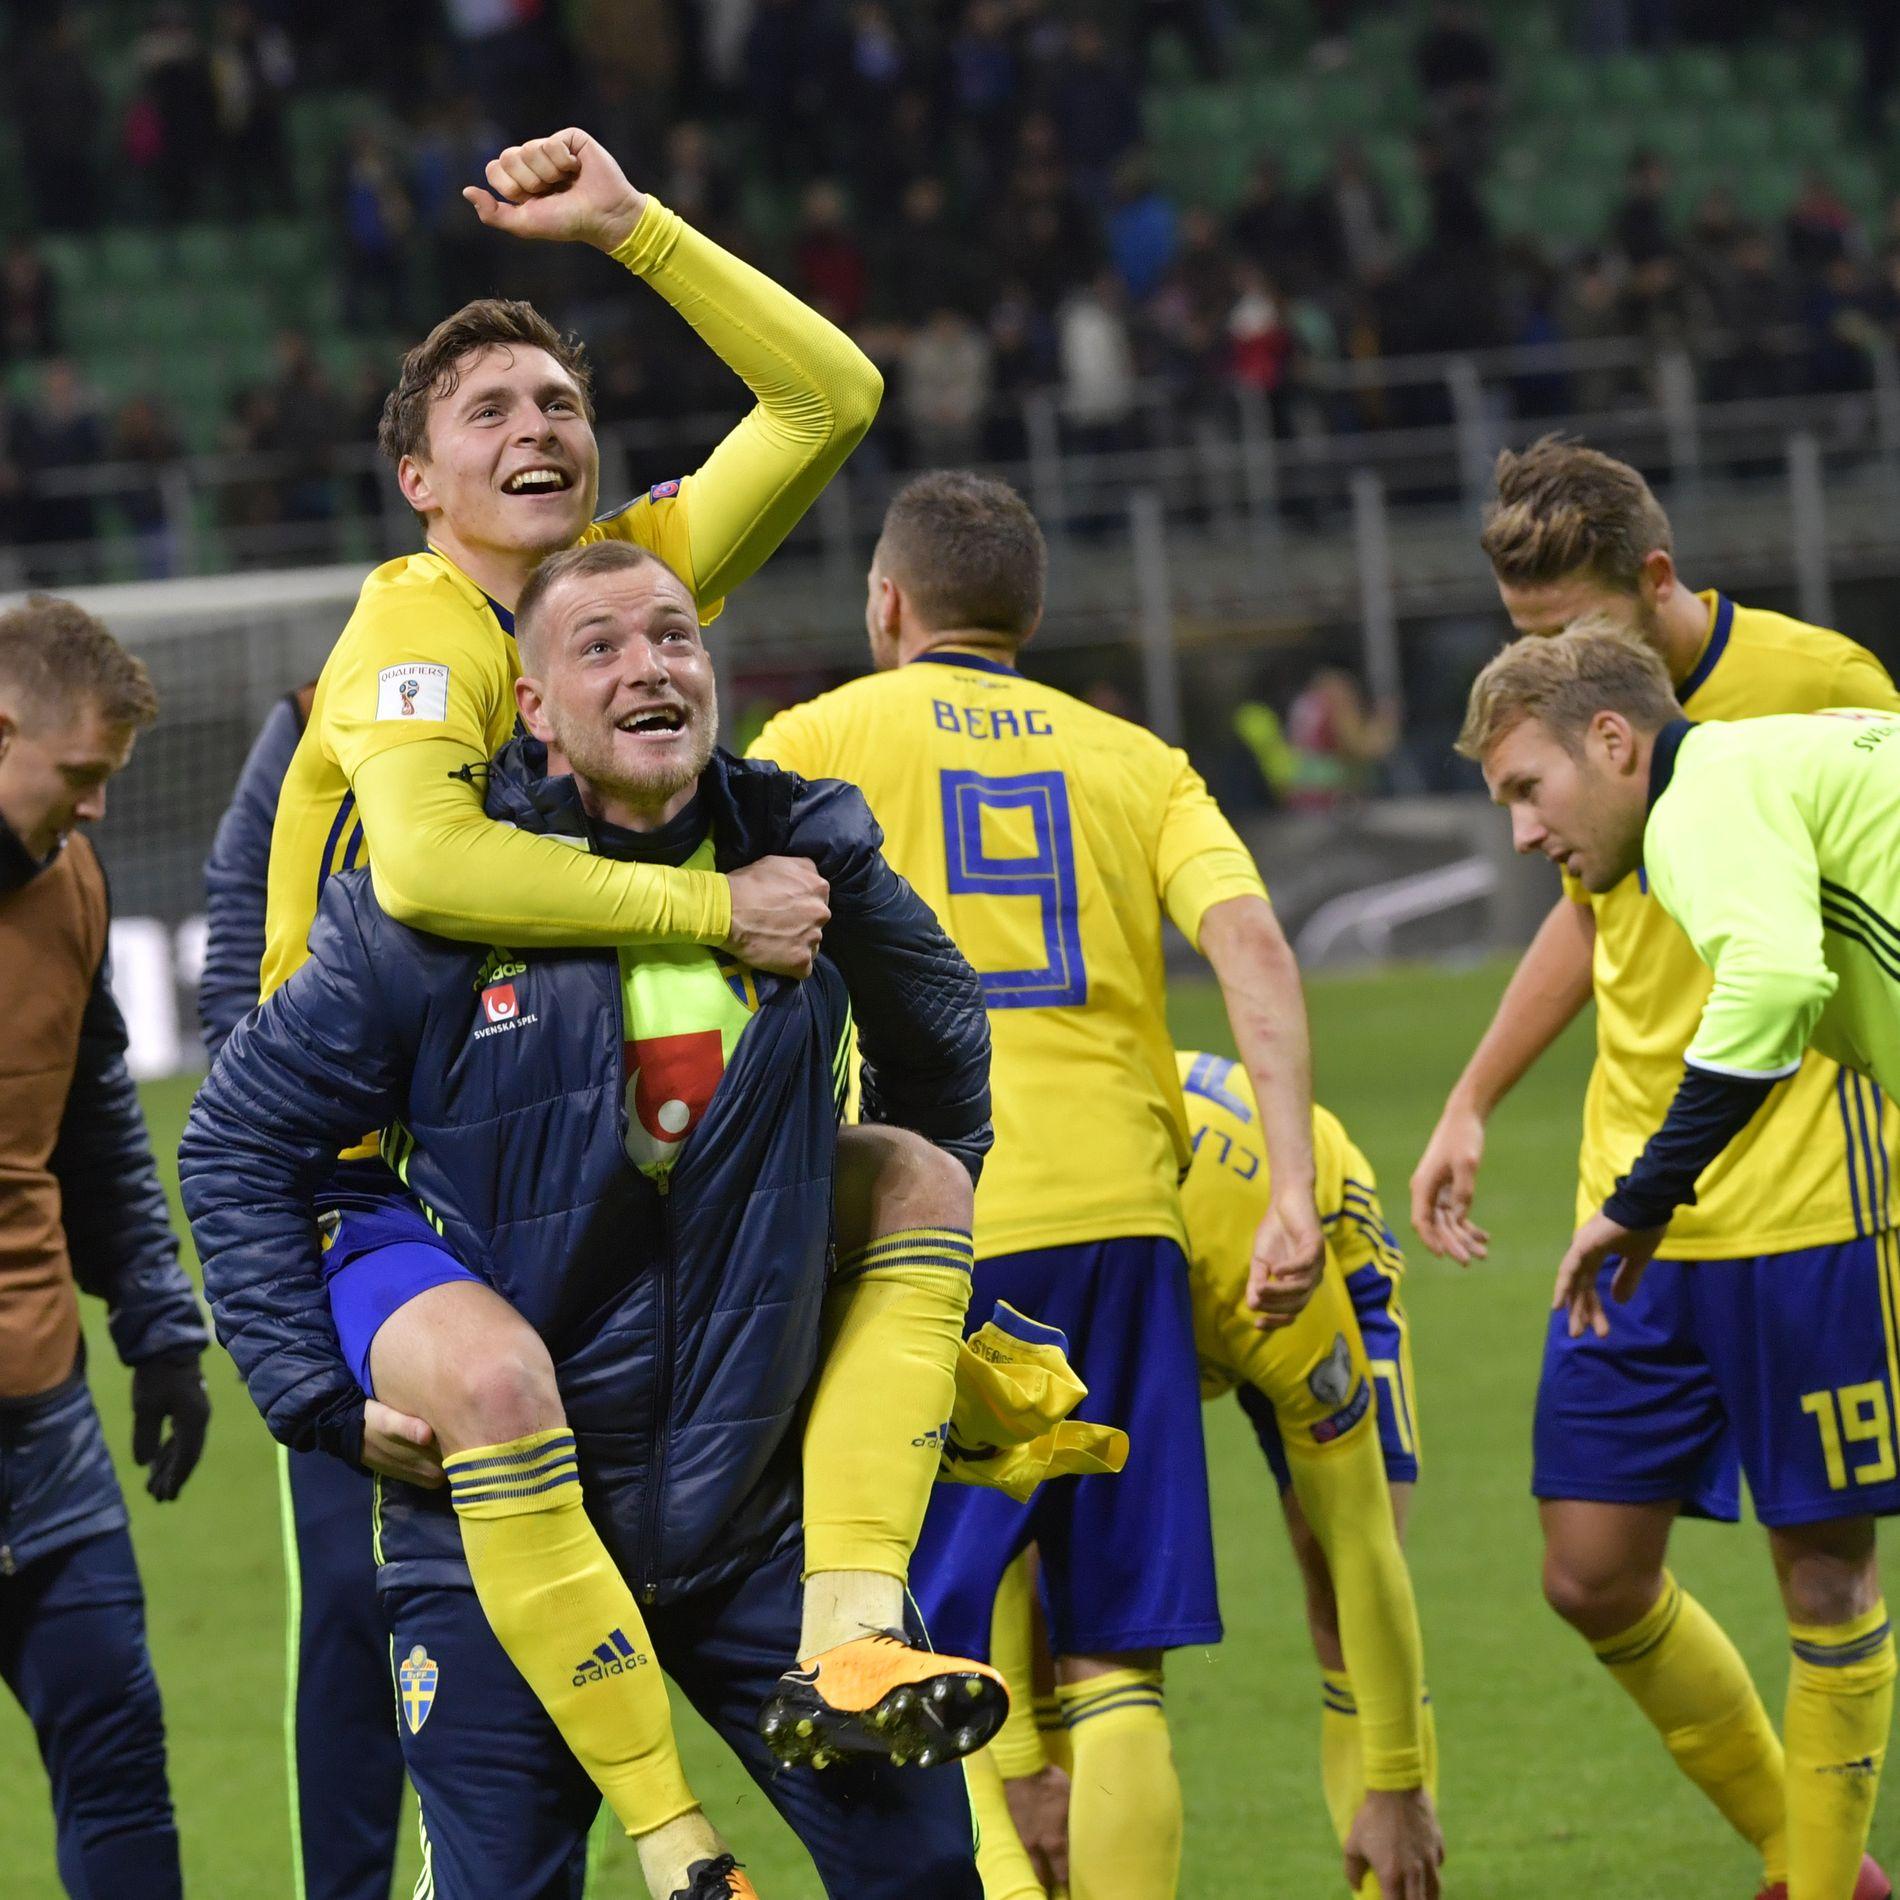 JUBEL FOR 0-0: Svenskene Victor Lindeløf og John Guidetti (foran) jubler etter at Sverige har klart 0-0 i Milano - og samtidig sendt svenskene til VM i Russland neste sommer.